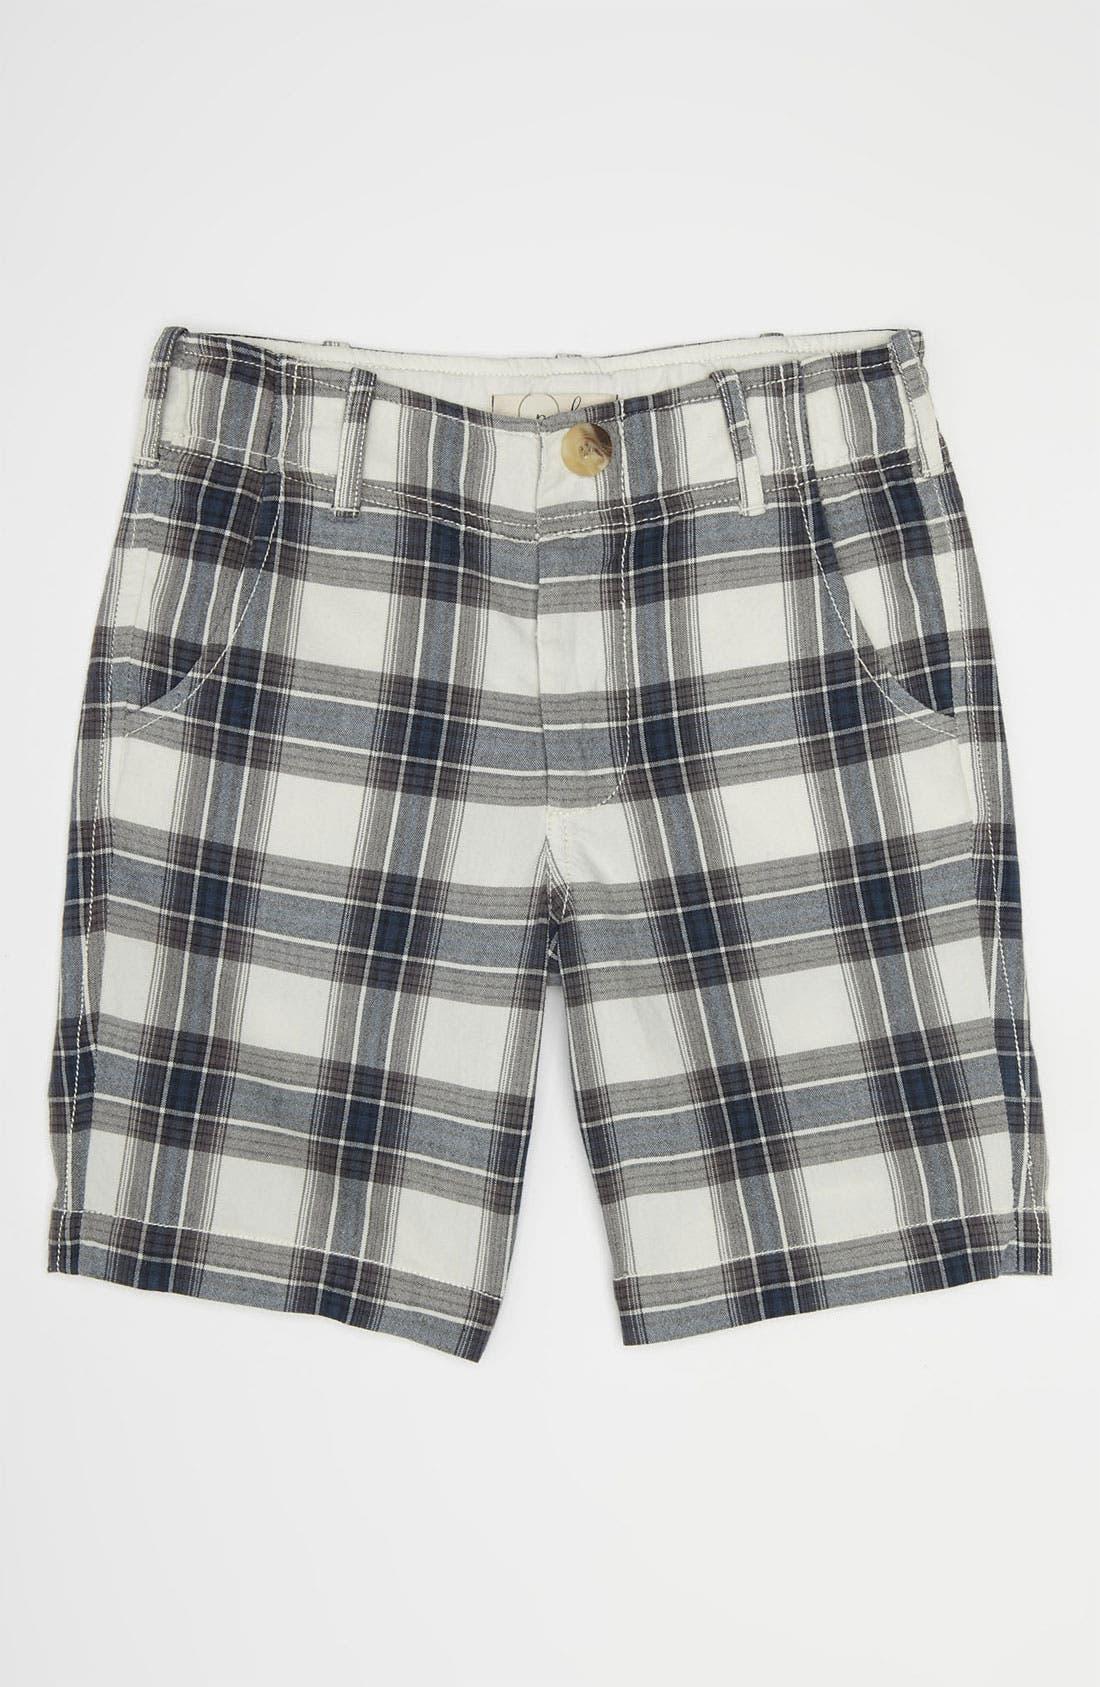 Alternate Image 1 Selected - Peek 'Montauk Hampton' Shorts (Toddler, Little Boys & Big Boys)